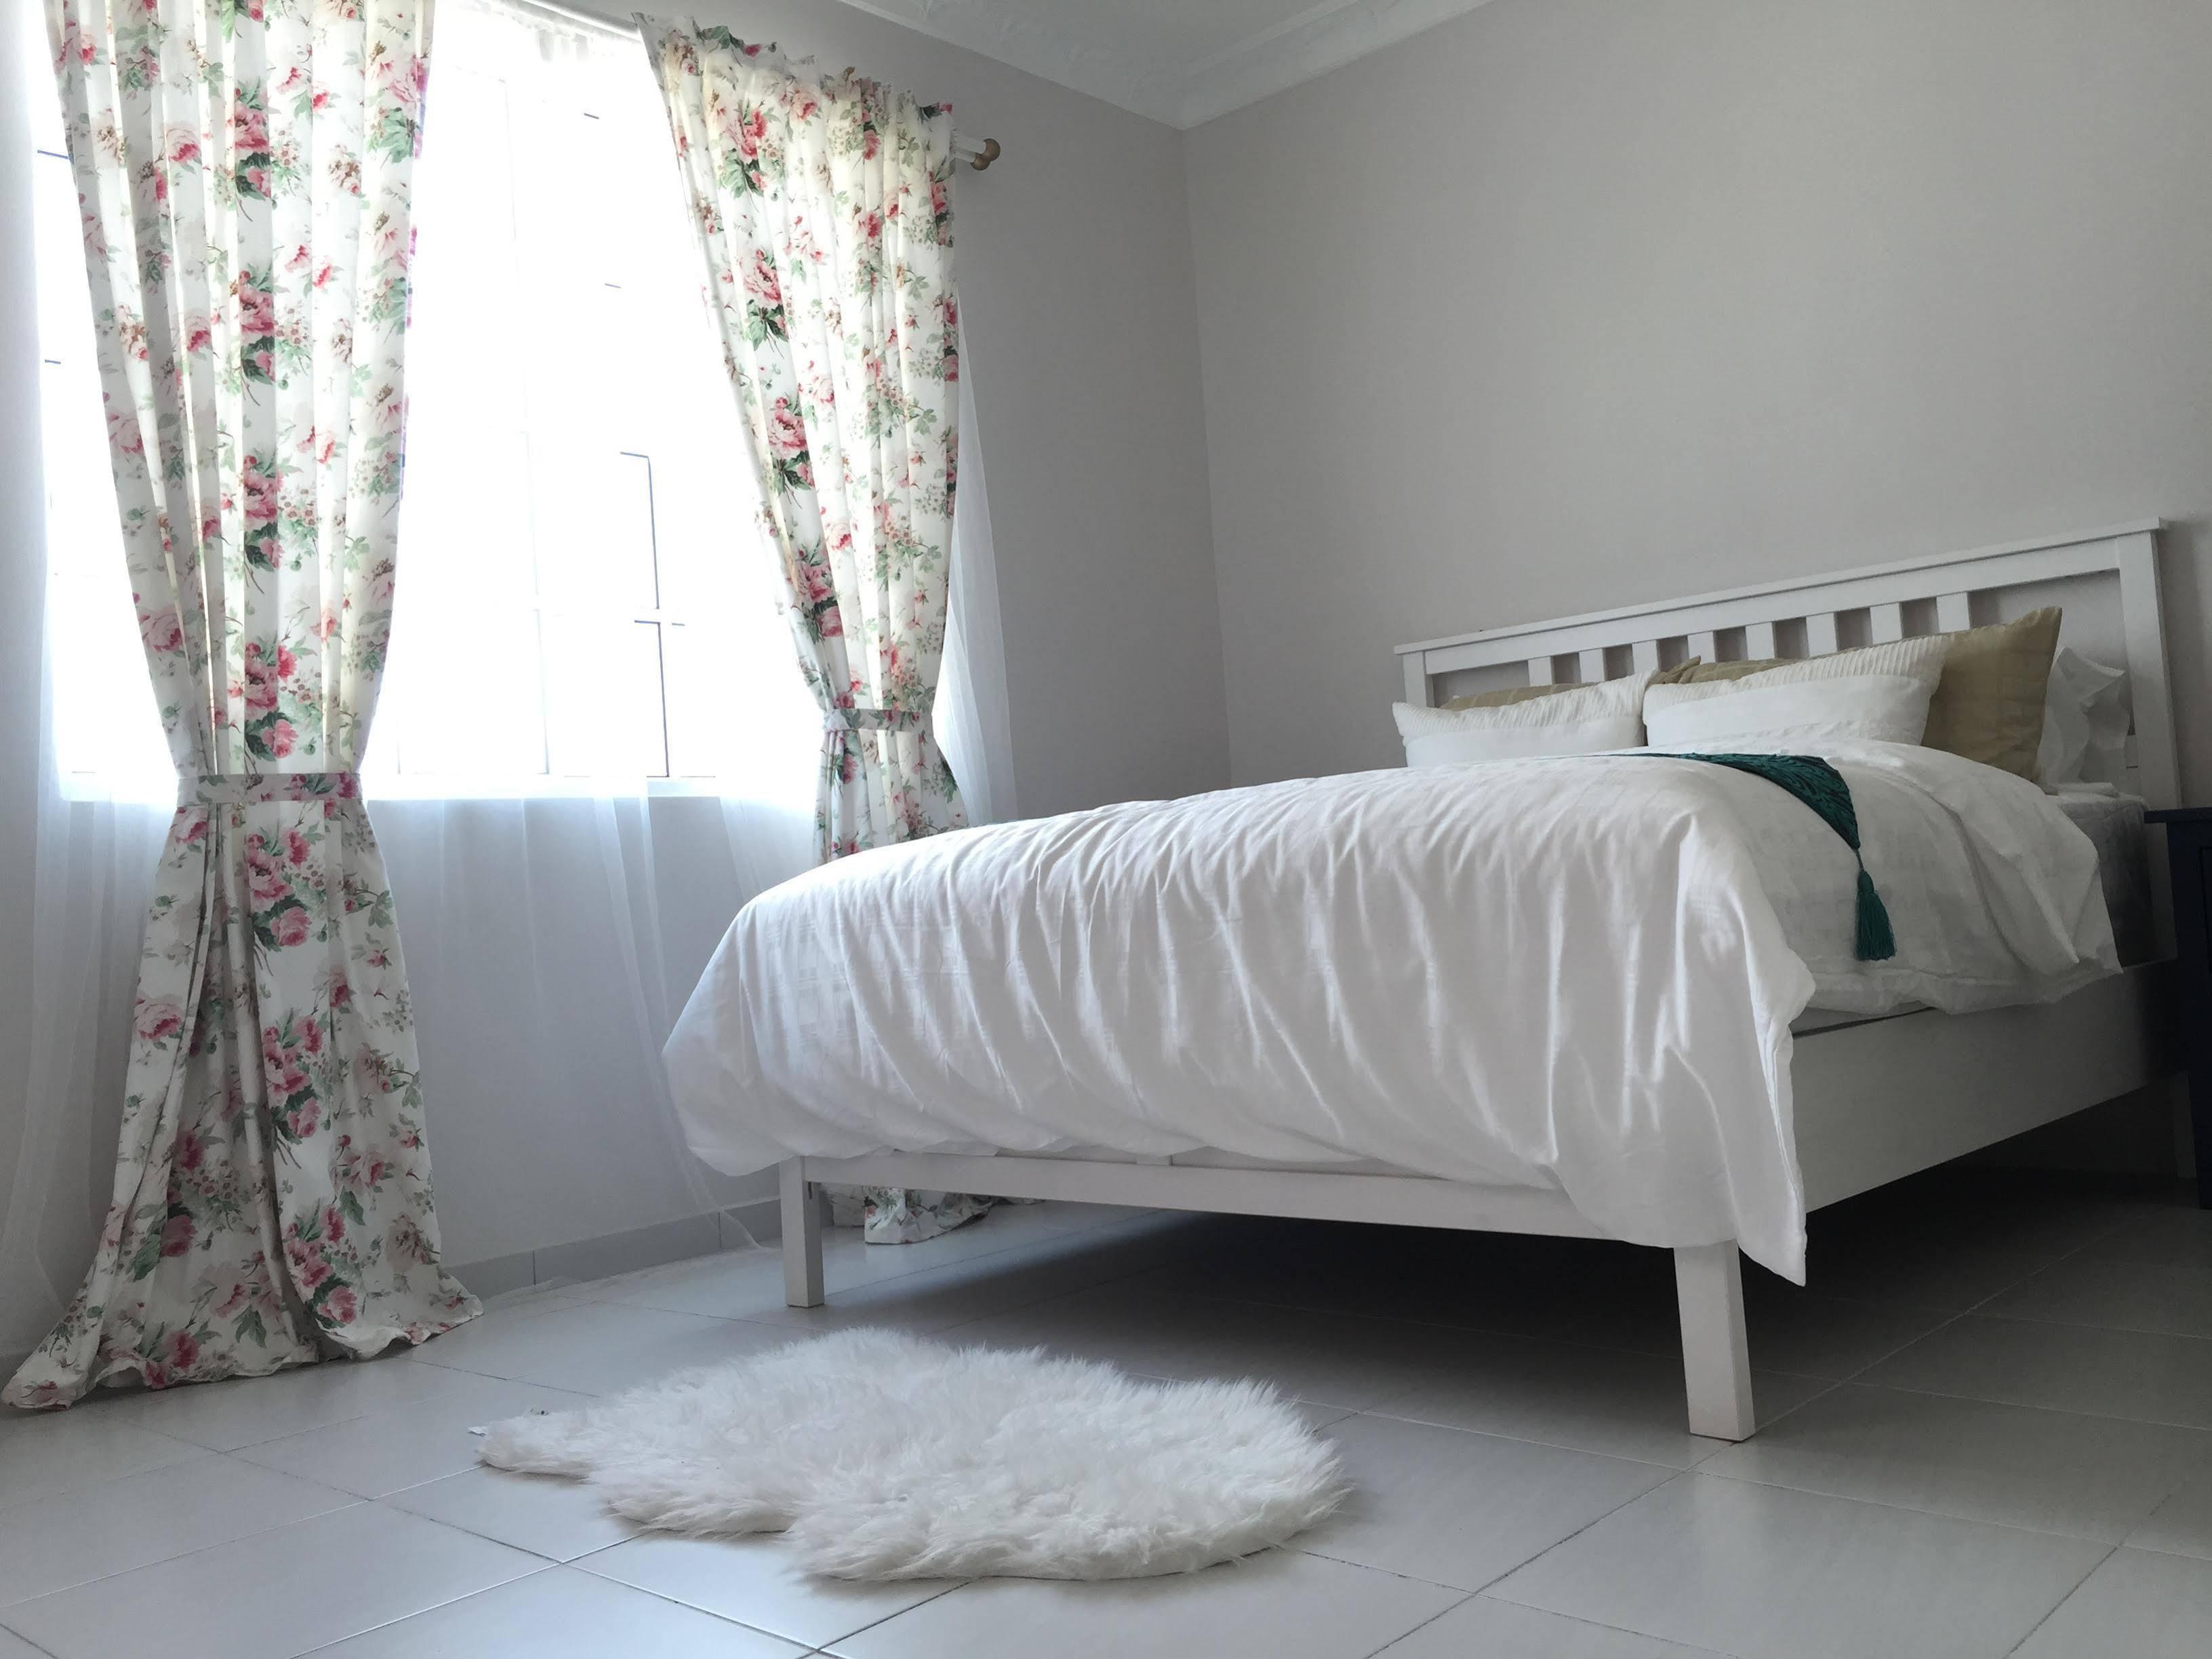 The Trails of Kampar Hotels & Resorts